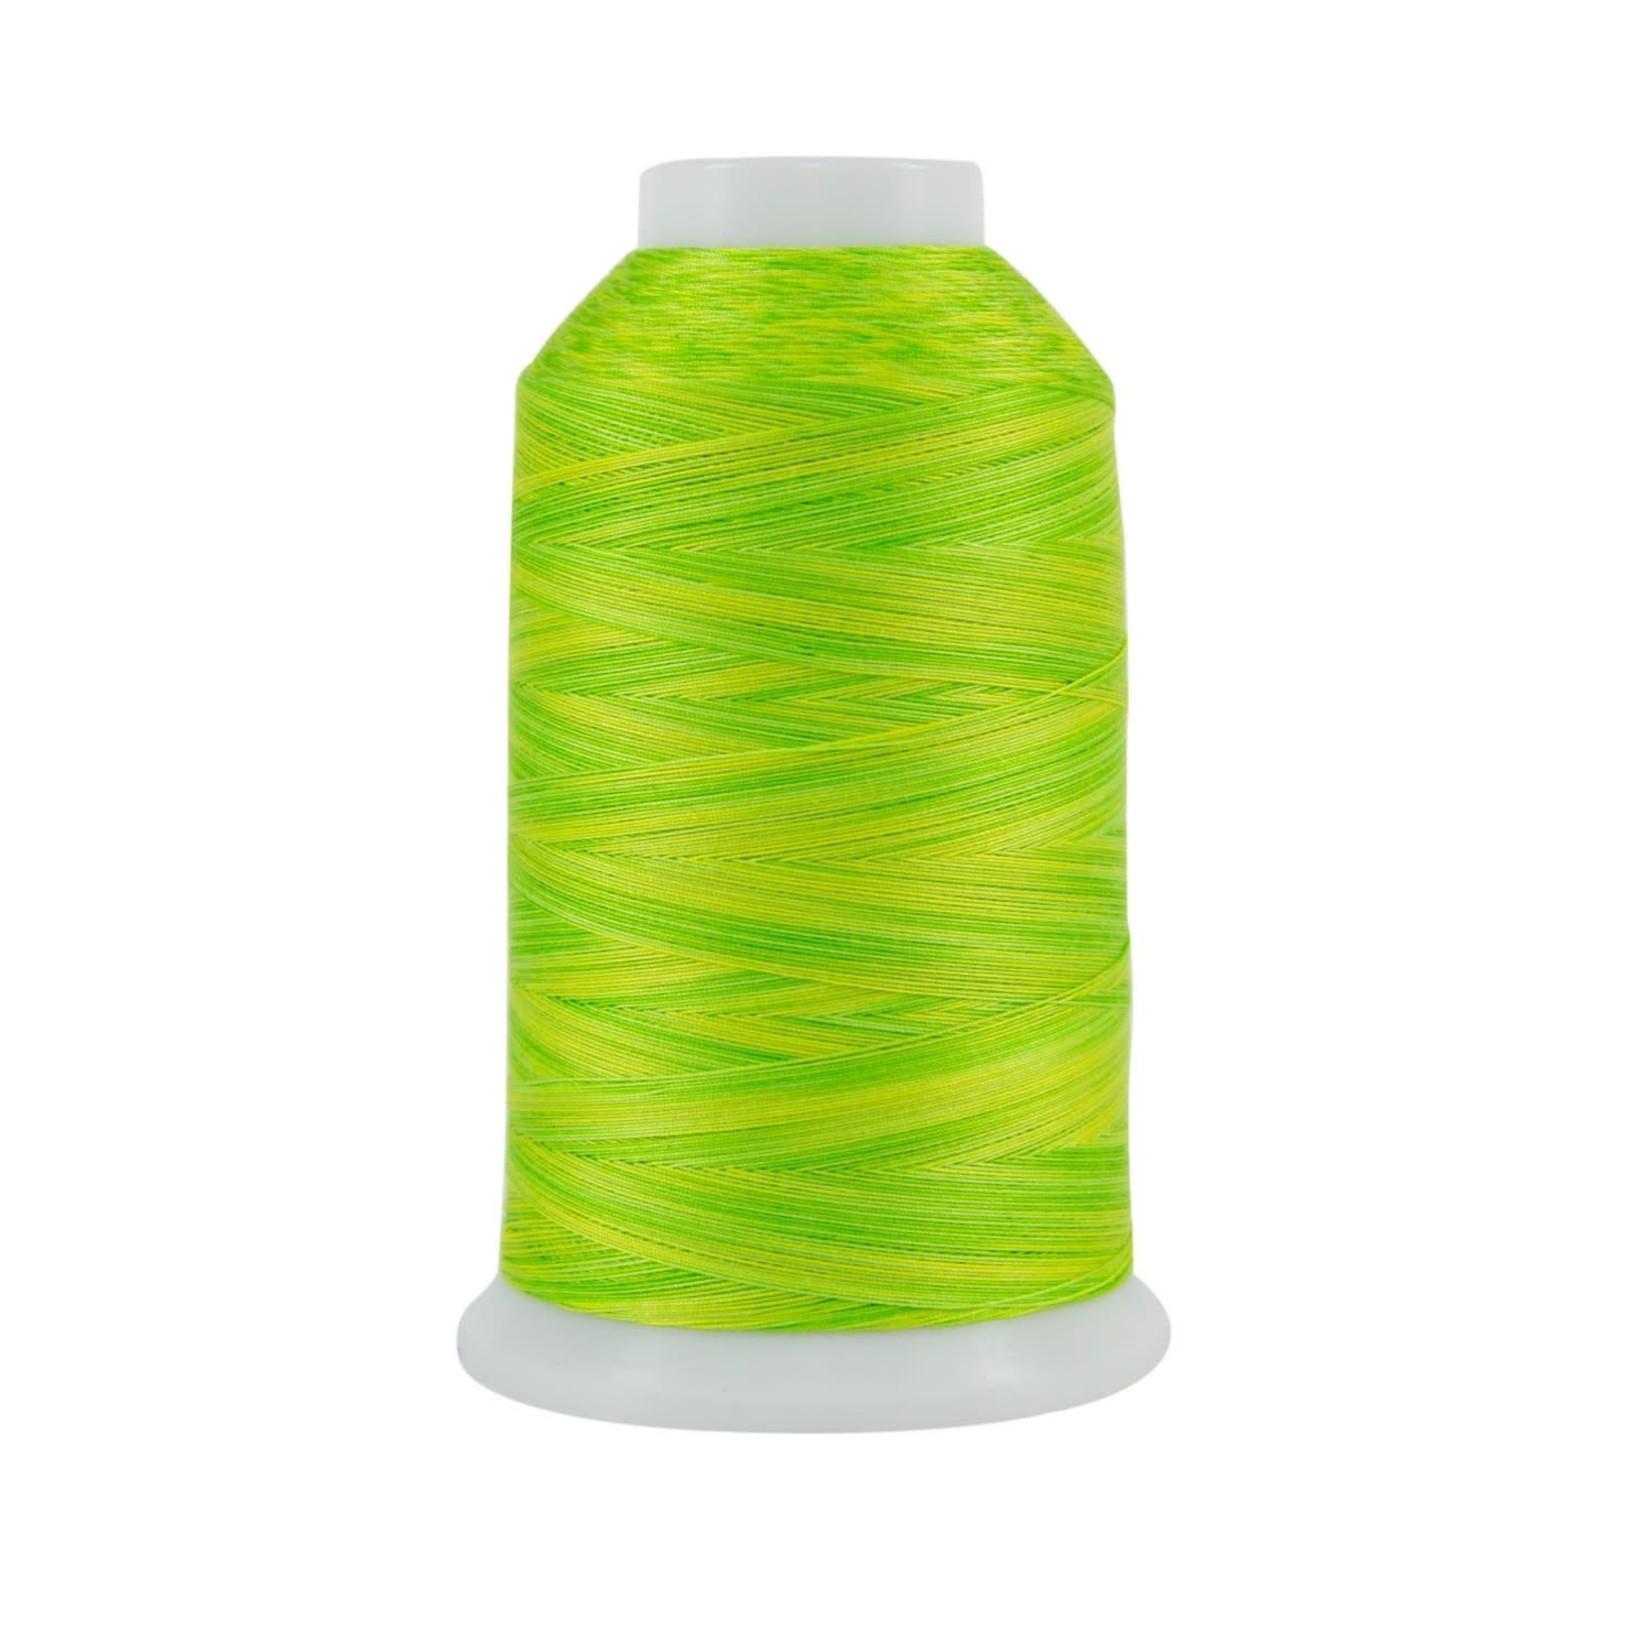 Superior Threads King Tut - #40 - 1828 m - 0924 Lime Stone